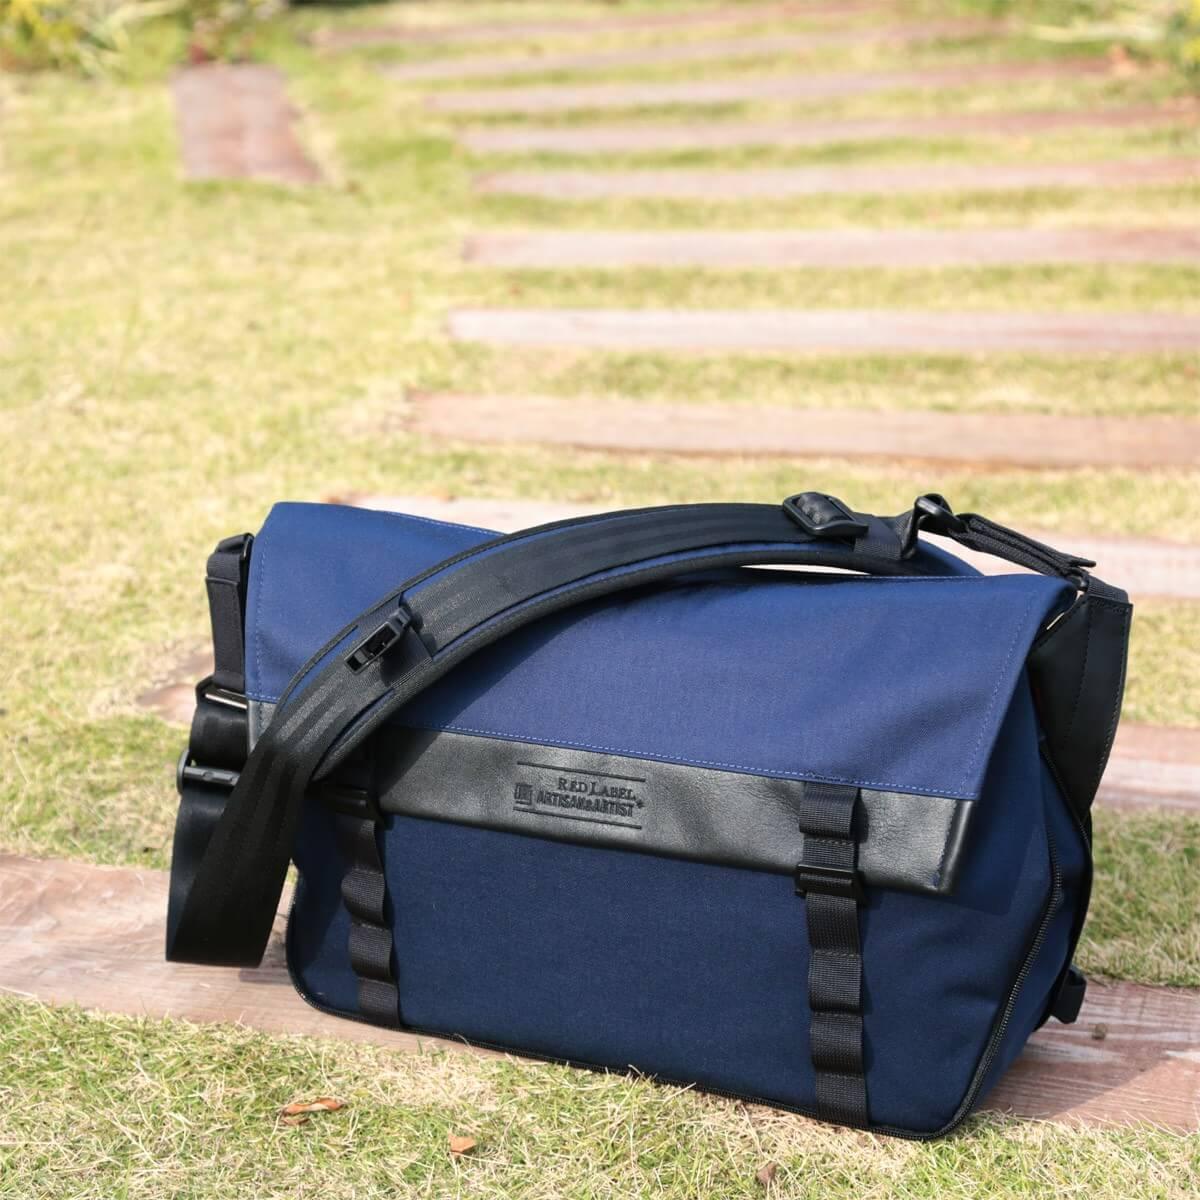 Artisan Artist RDB MG300 Messenger Bag 15